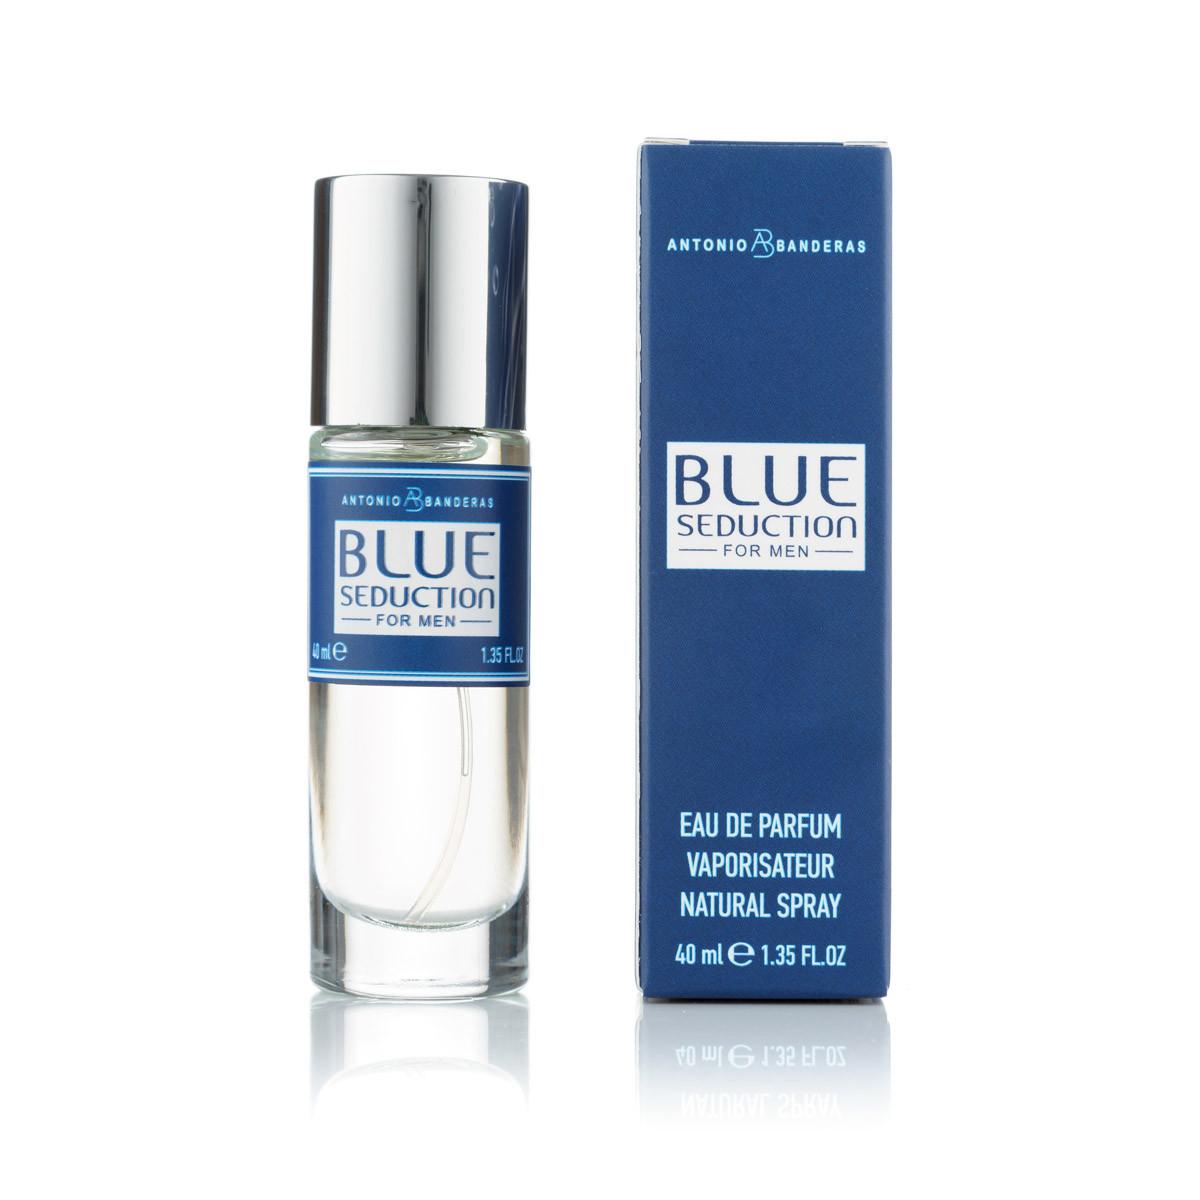 Мужской мини парфюм Antonio Banderas Blue Seduction - 40 мл (320)